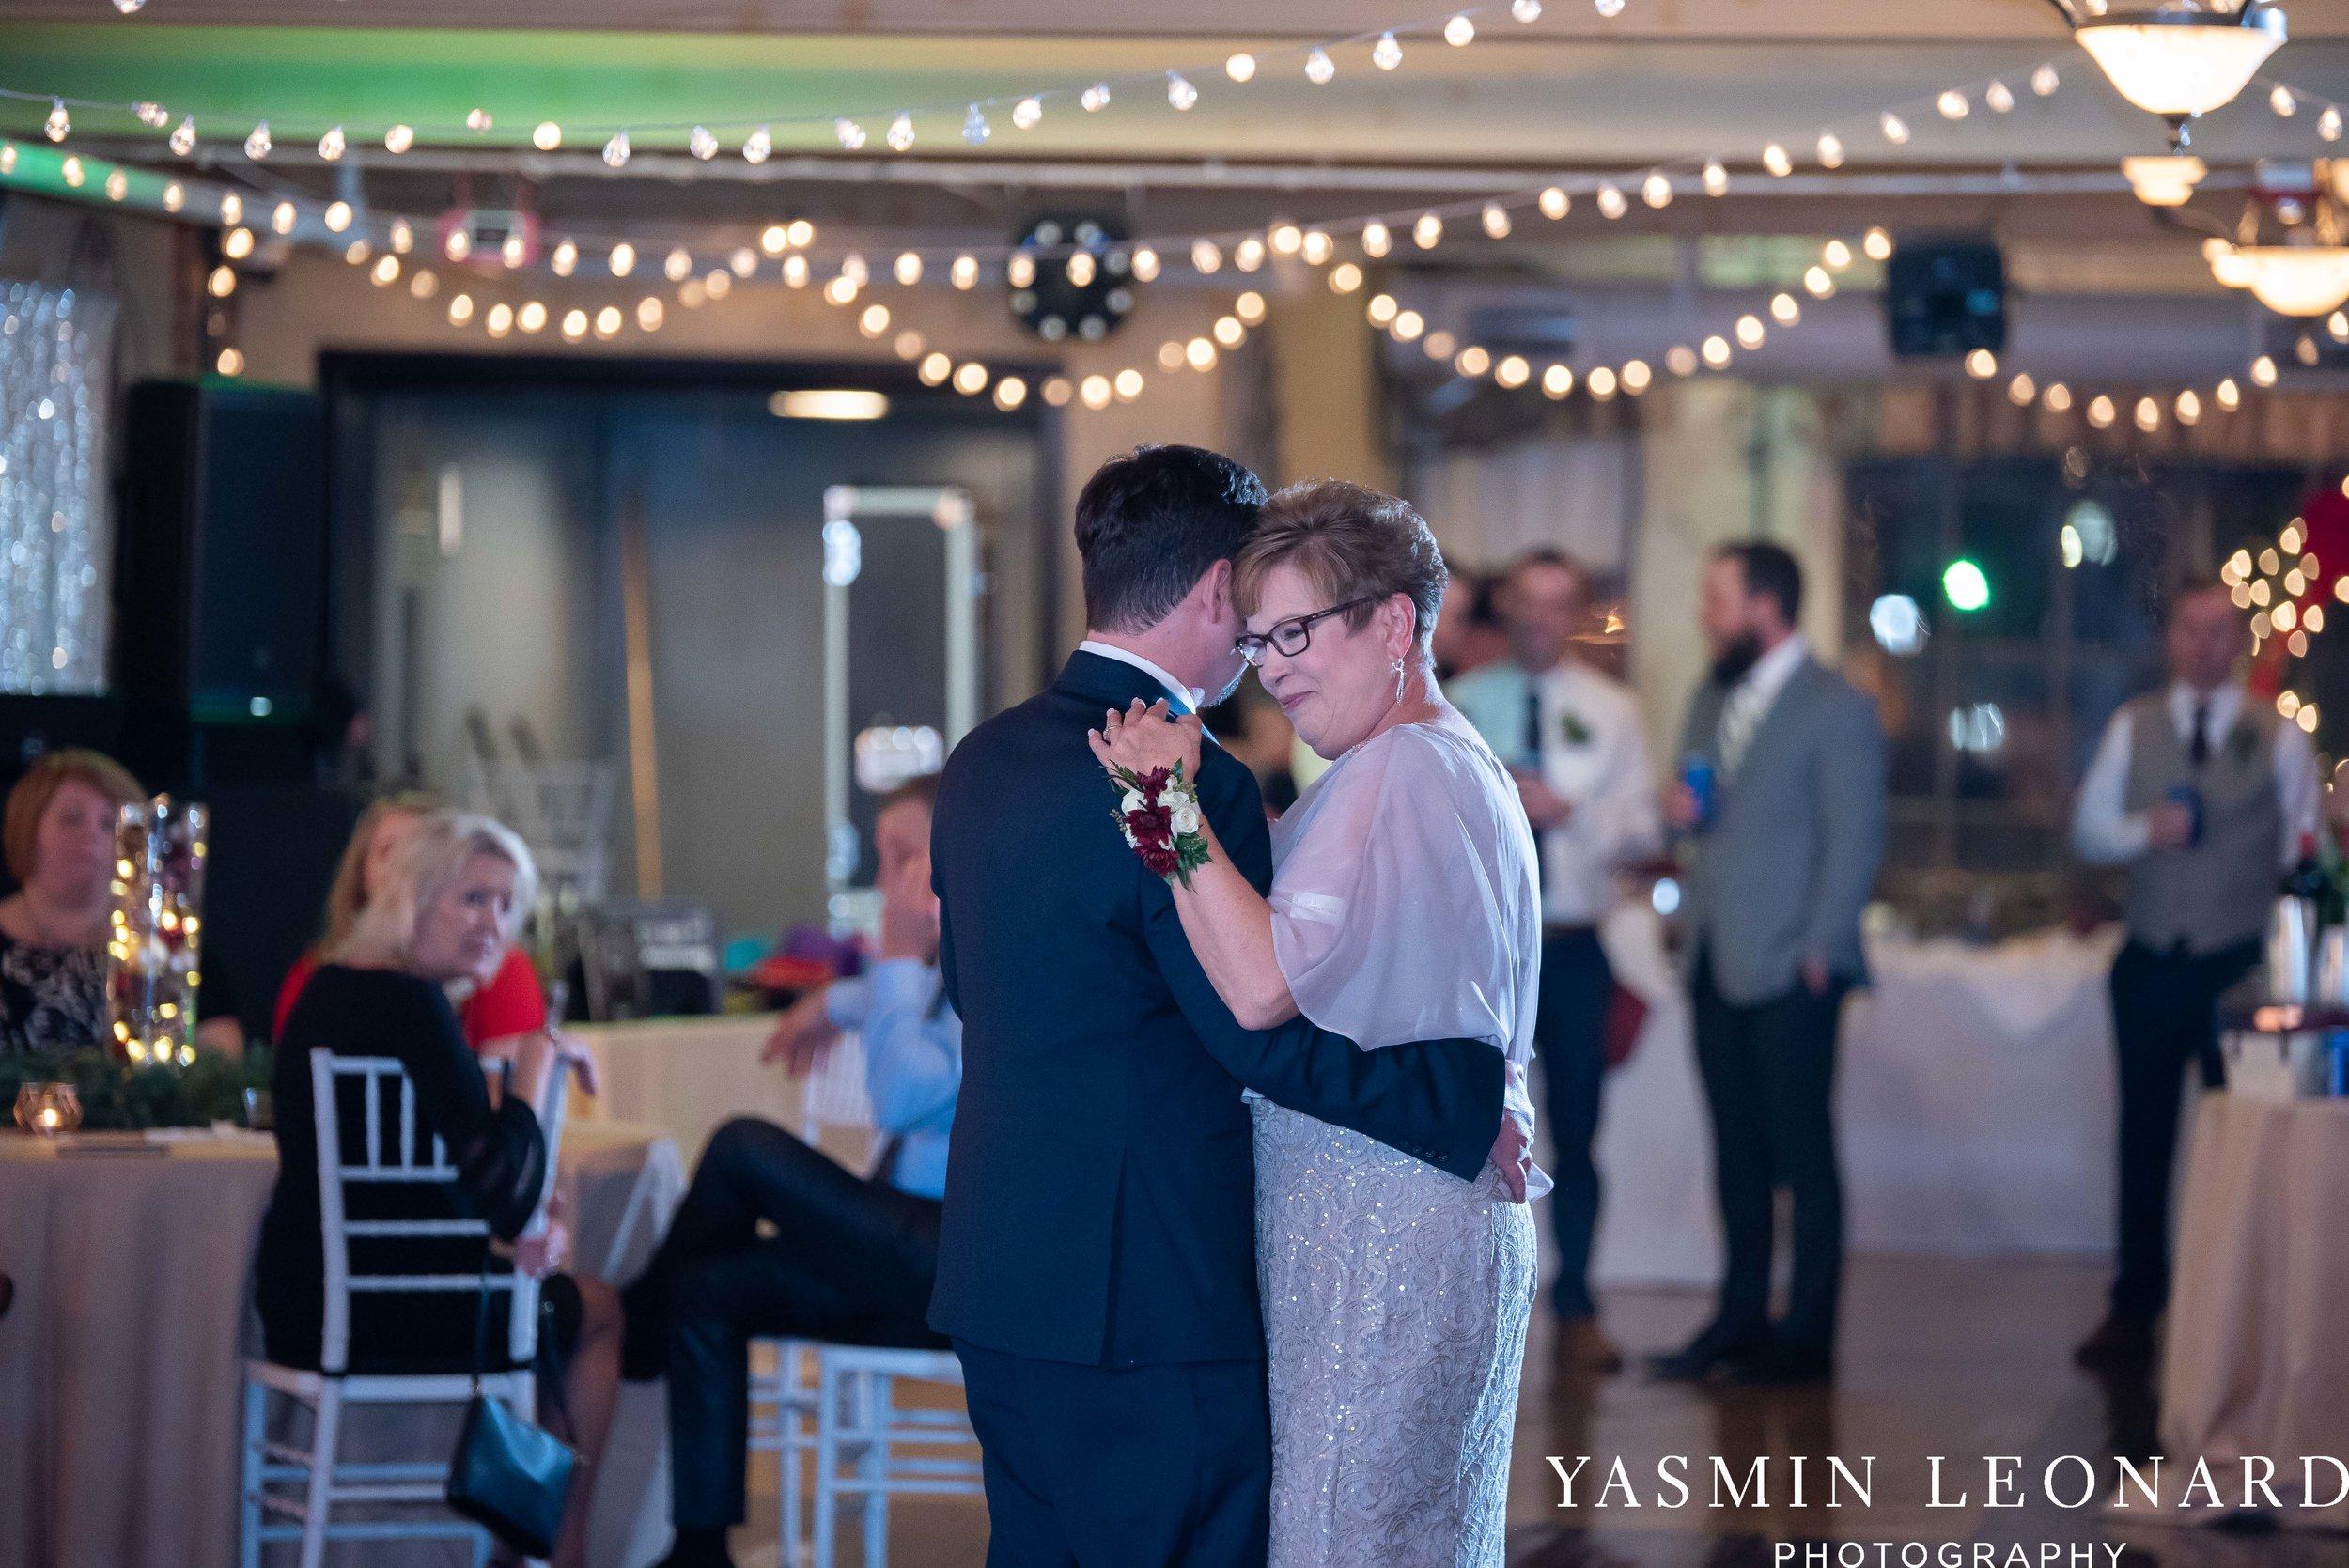 Rebekah and Matt - 105 Worth Event Centre - Yasmin Leonard Photography - Asheboro Wedding - NC Wedding - High Point Weddings - Triad Weddings - Winter Wedding-53.jpg